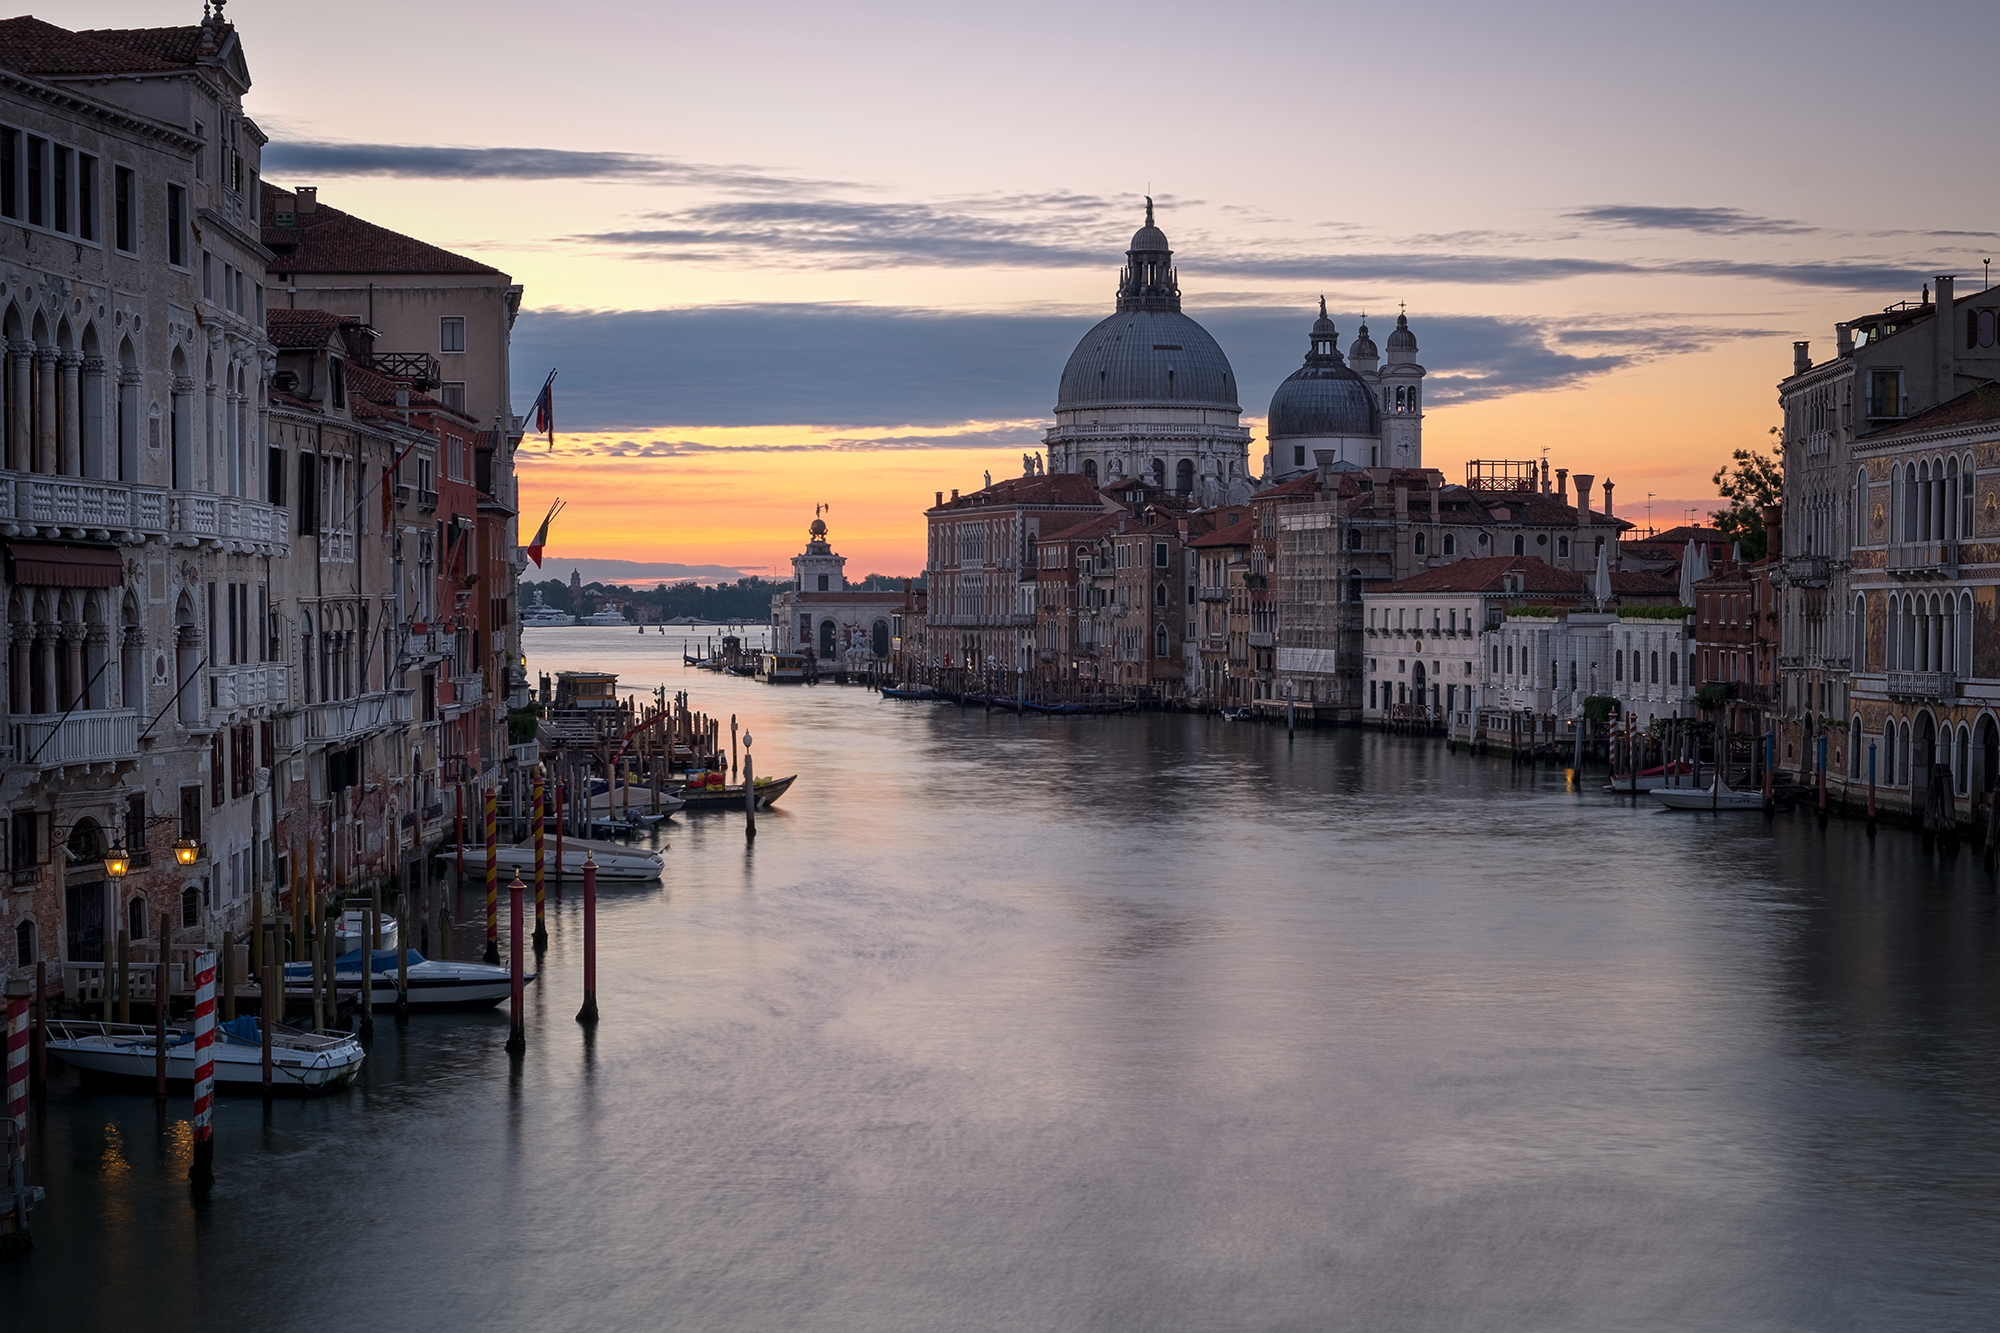 Sunrise at the Grand Canal II, Venice